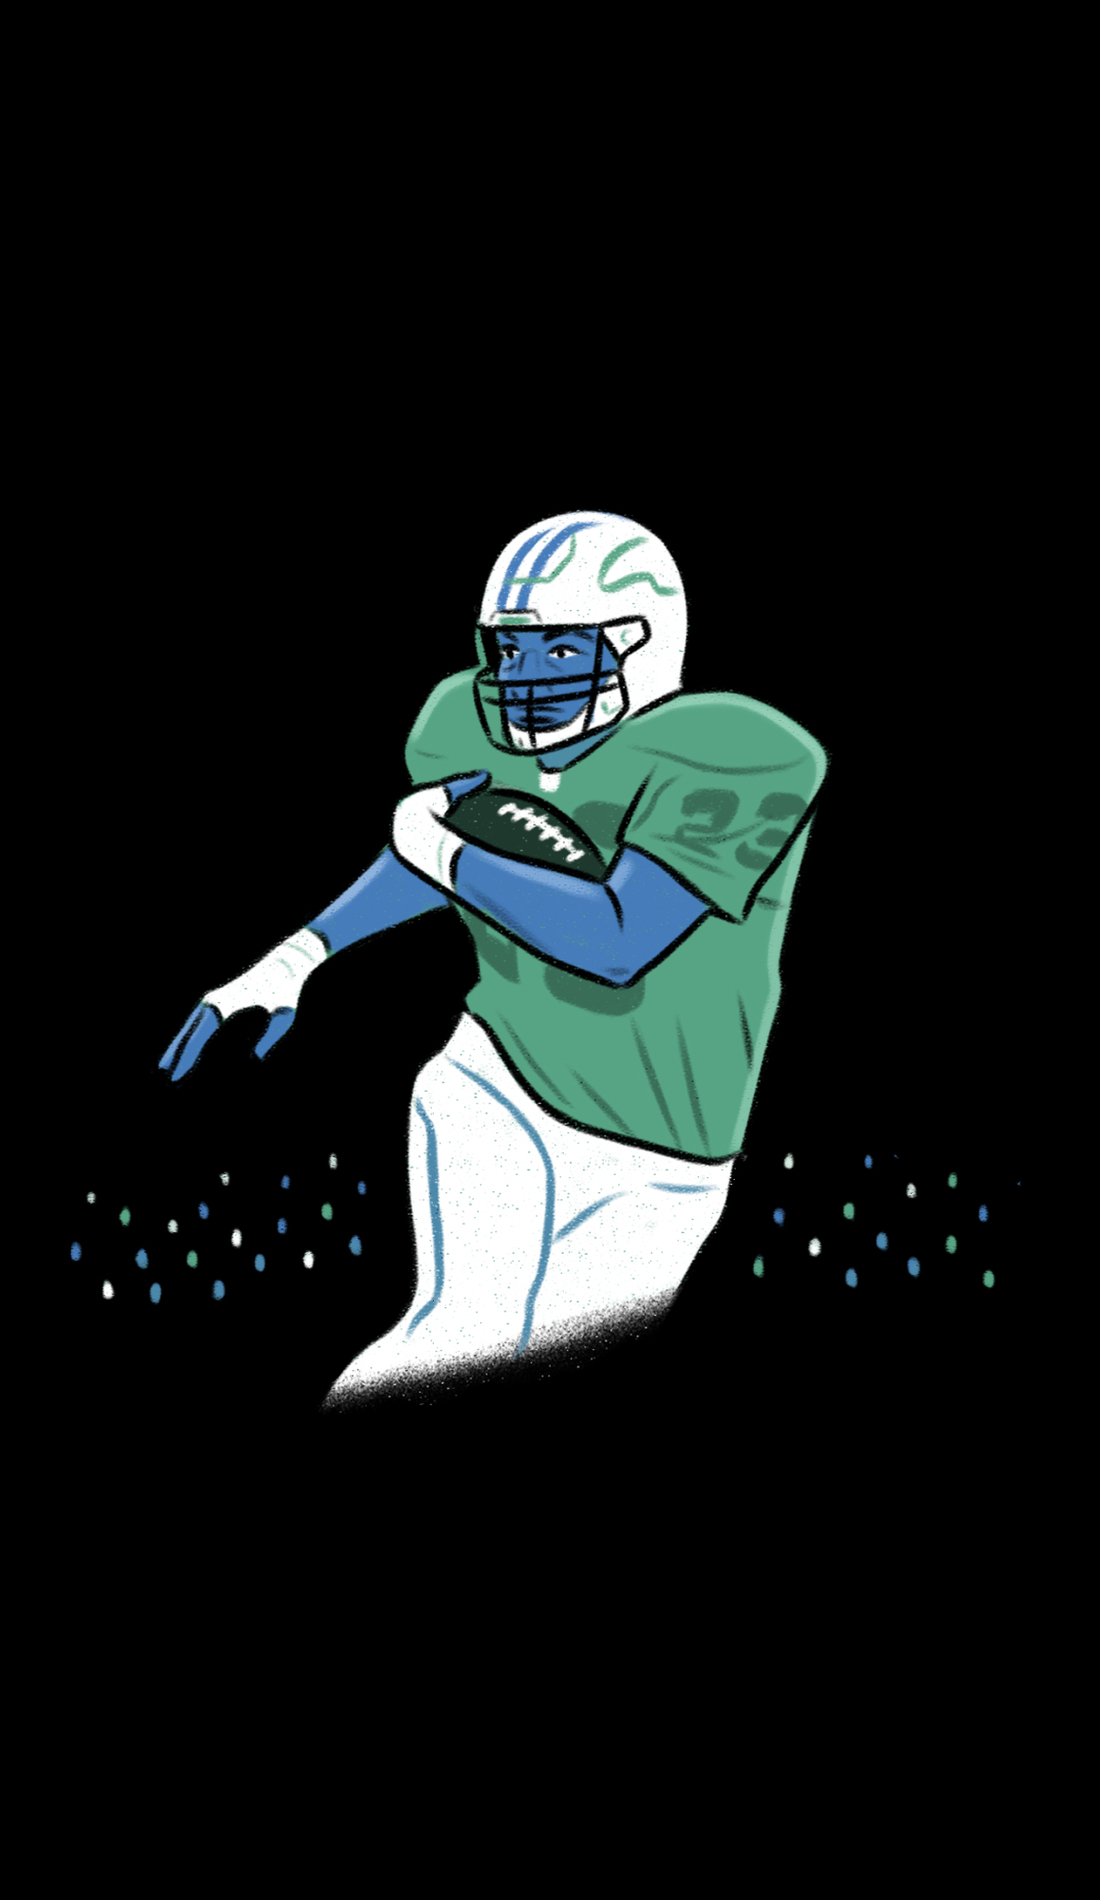 A Florida International University Golden Panthers Football live event